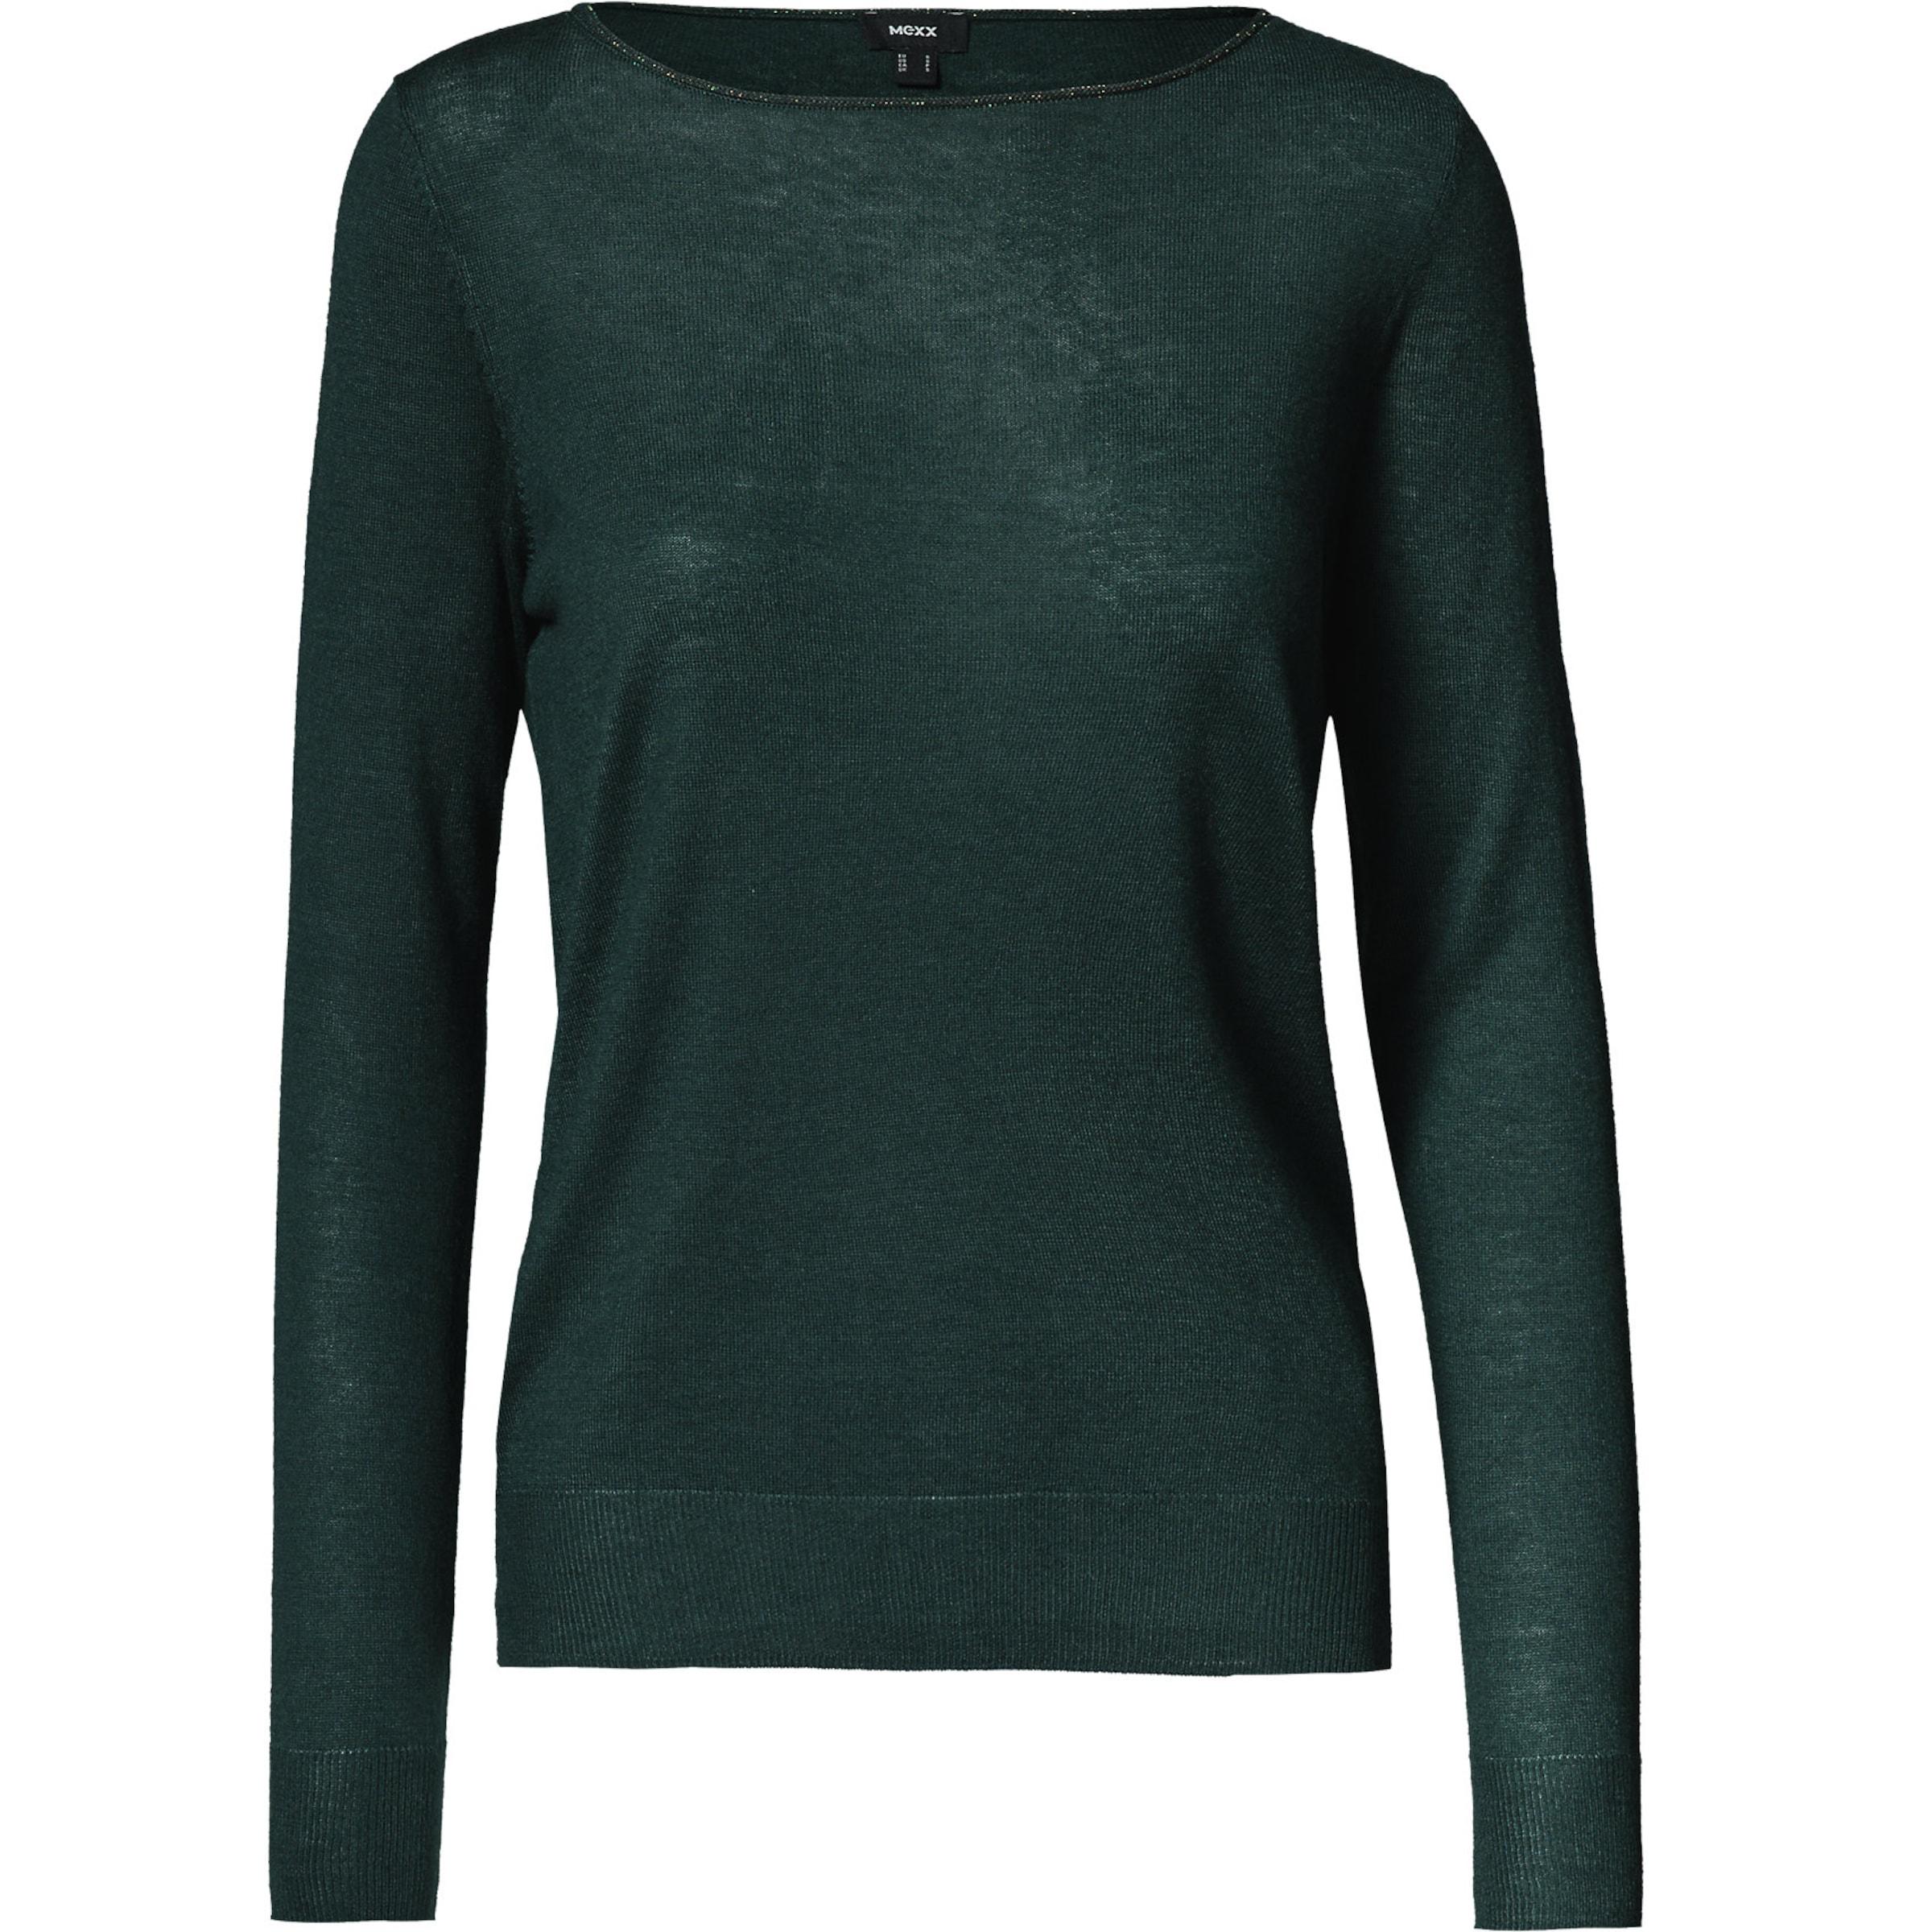 Fälschung Günstig Online MEXX Pullover Günstig Kaufen Großen Rabatt h5LjS3EHz